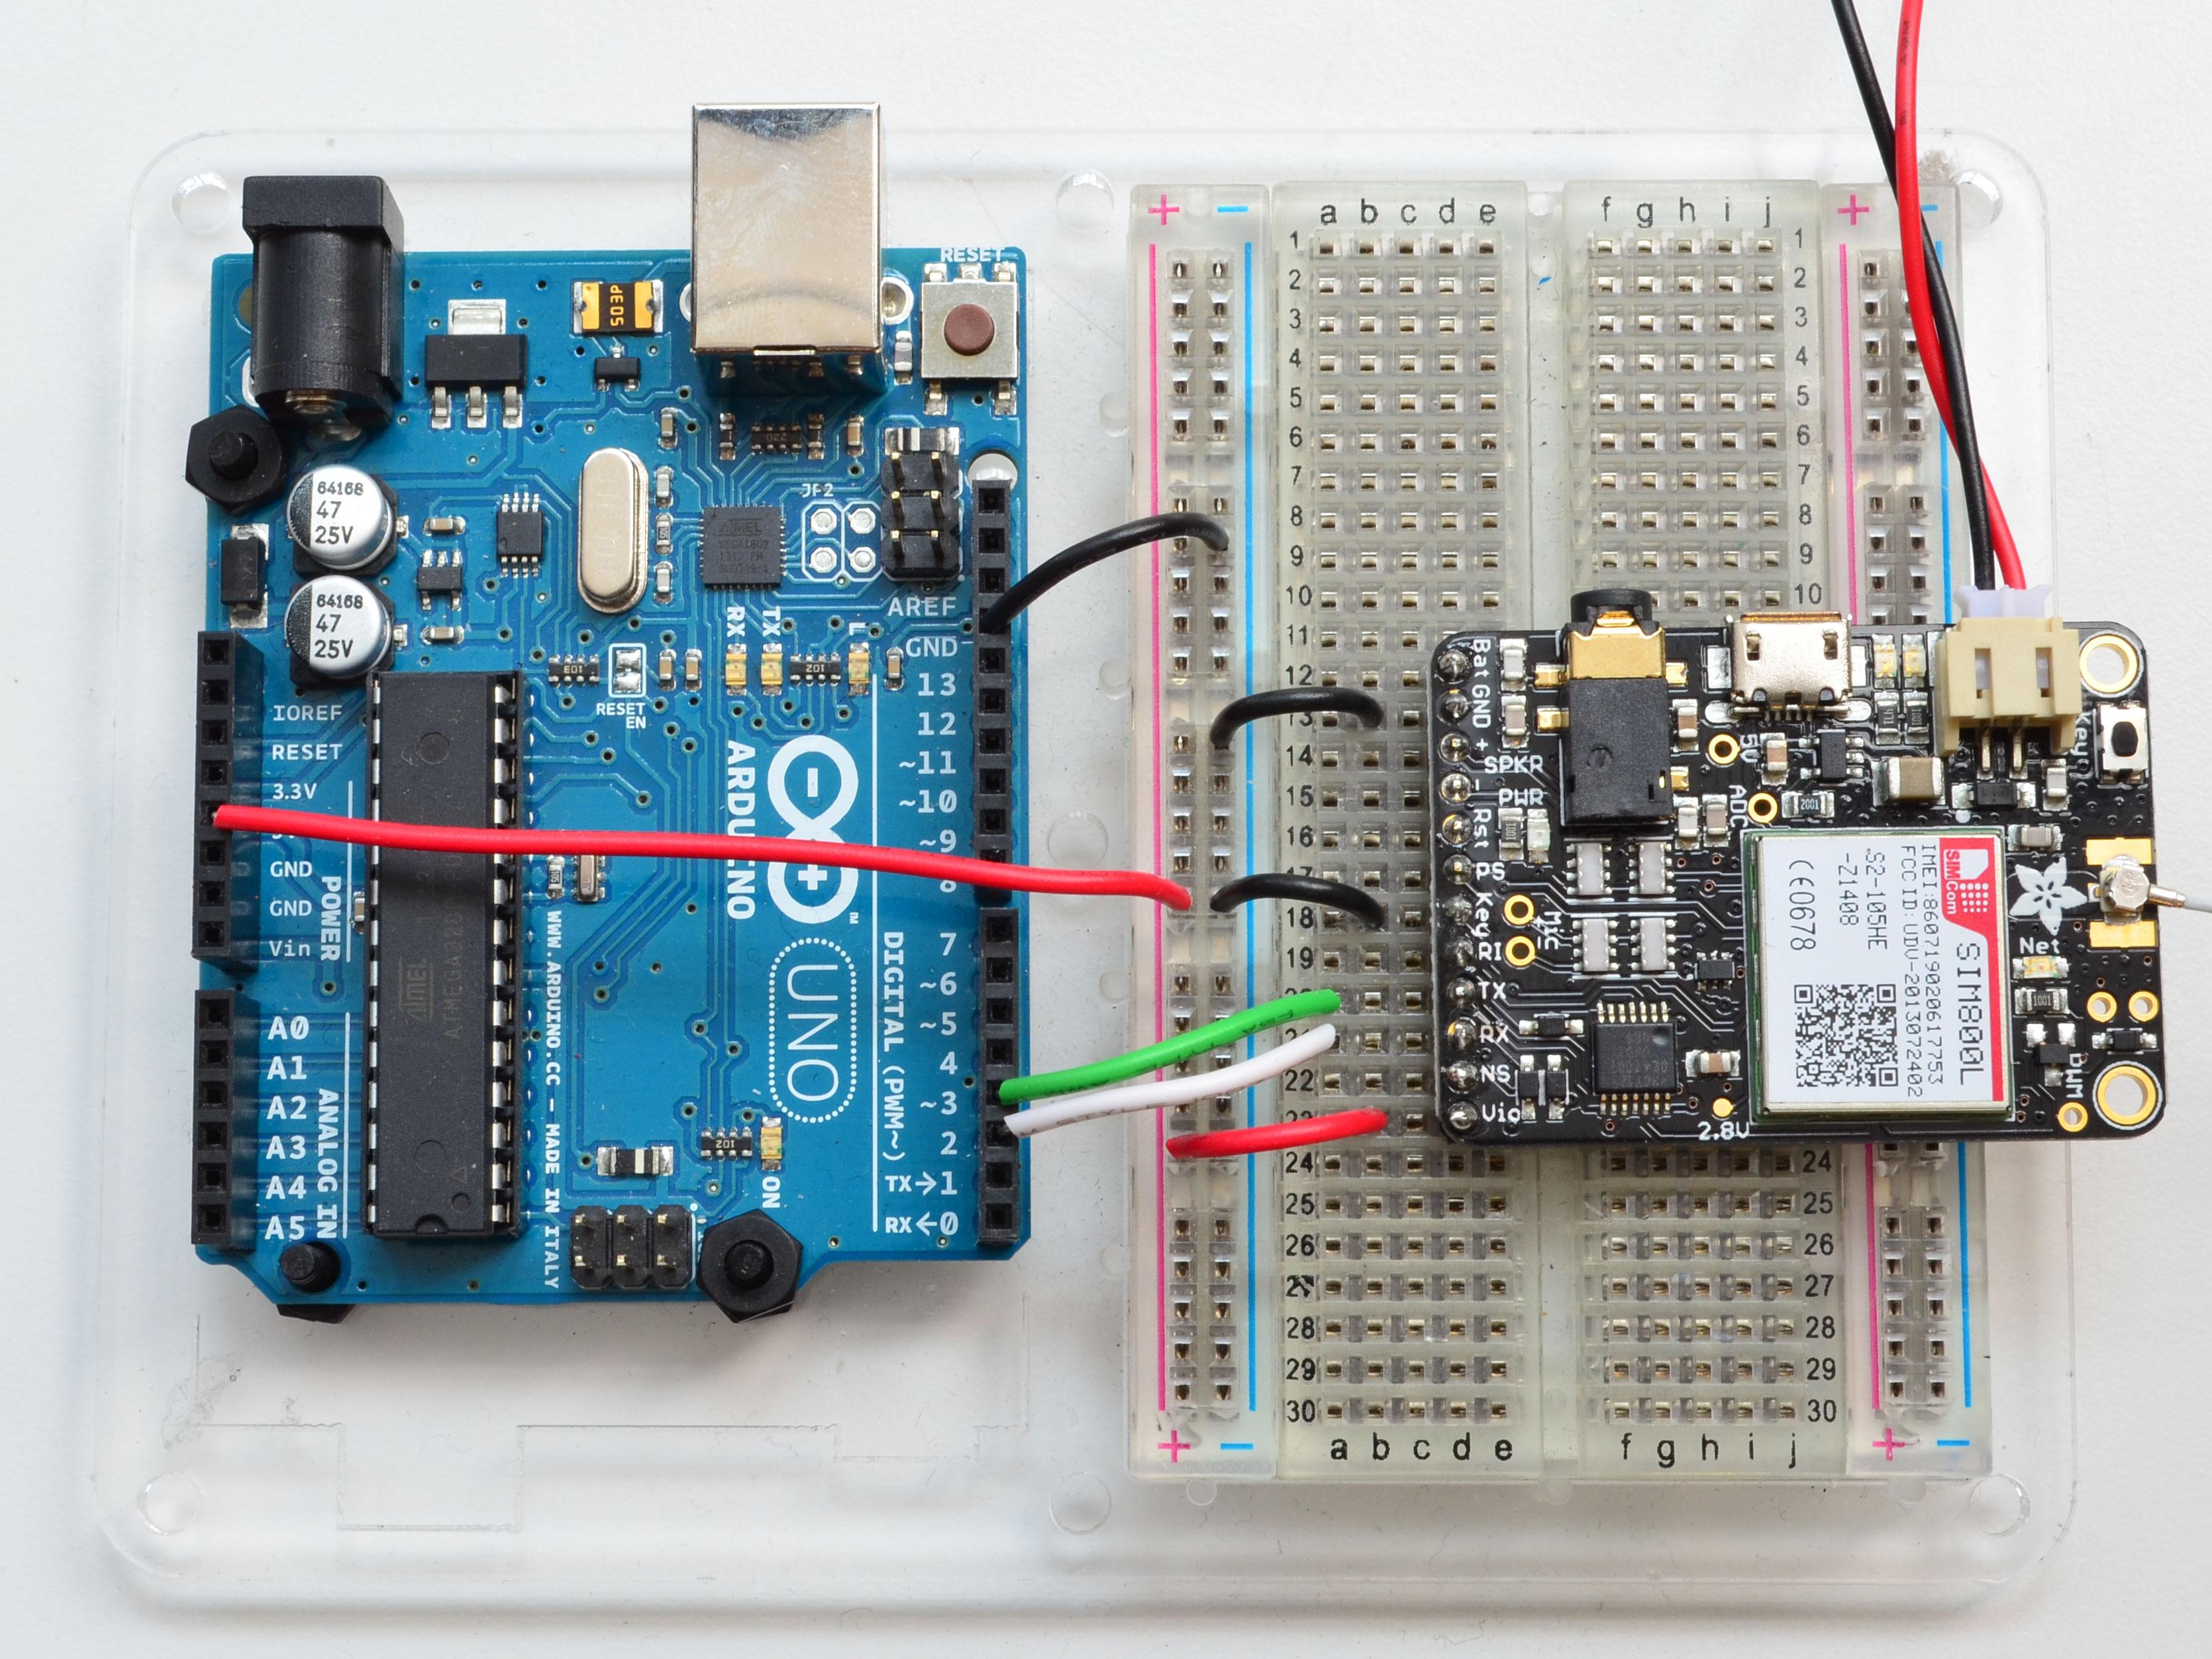 adafruit_products_arduinowire.jpg